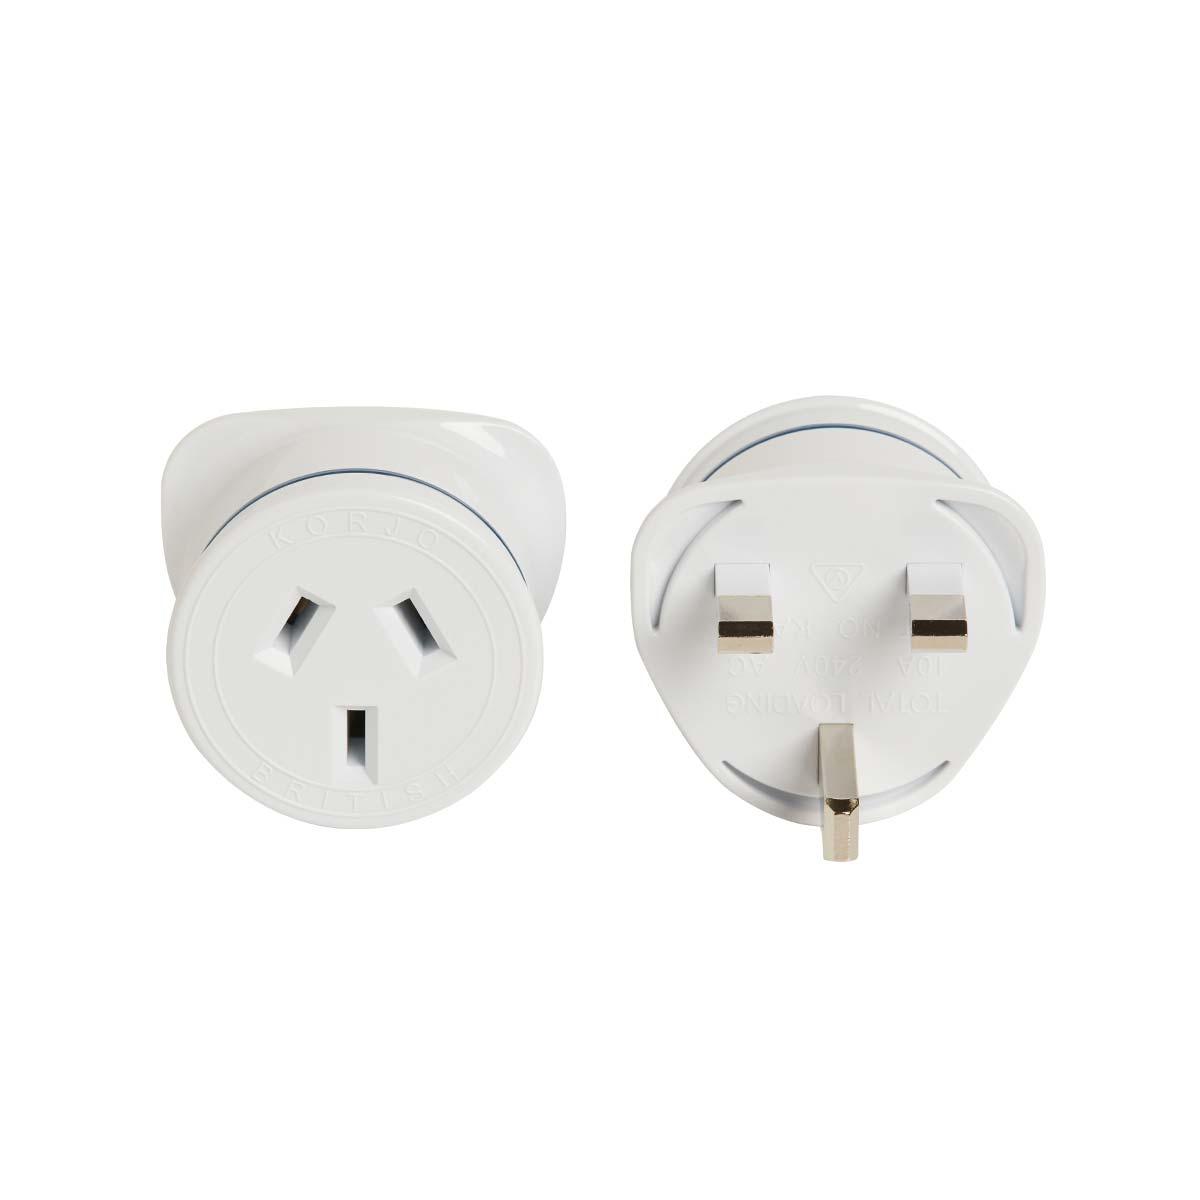 Korjo Electrical Adaptor Au To Uk Great Britain By